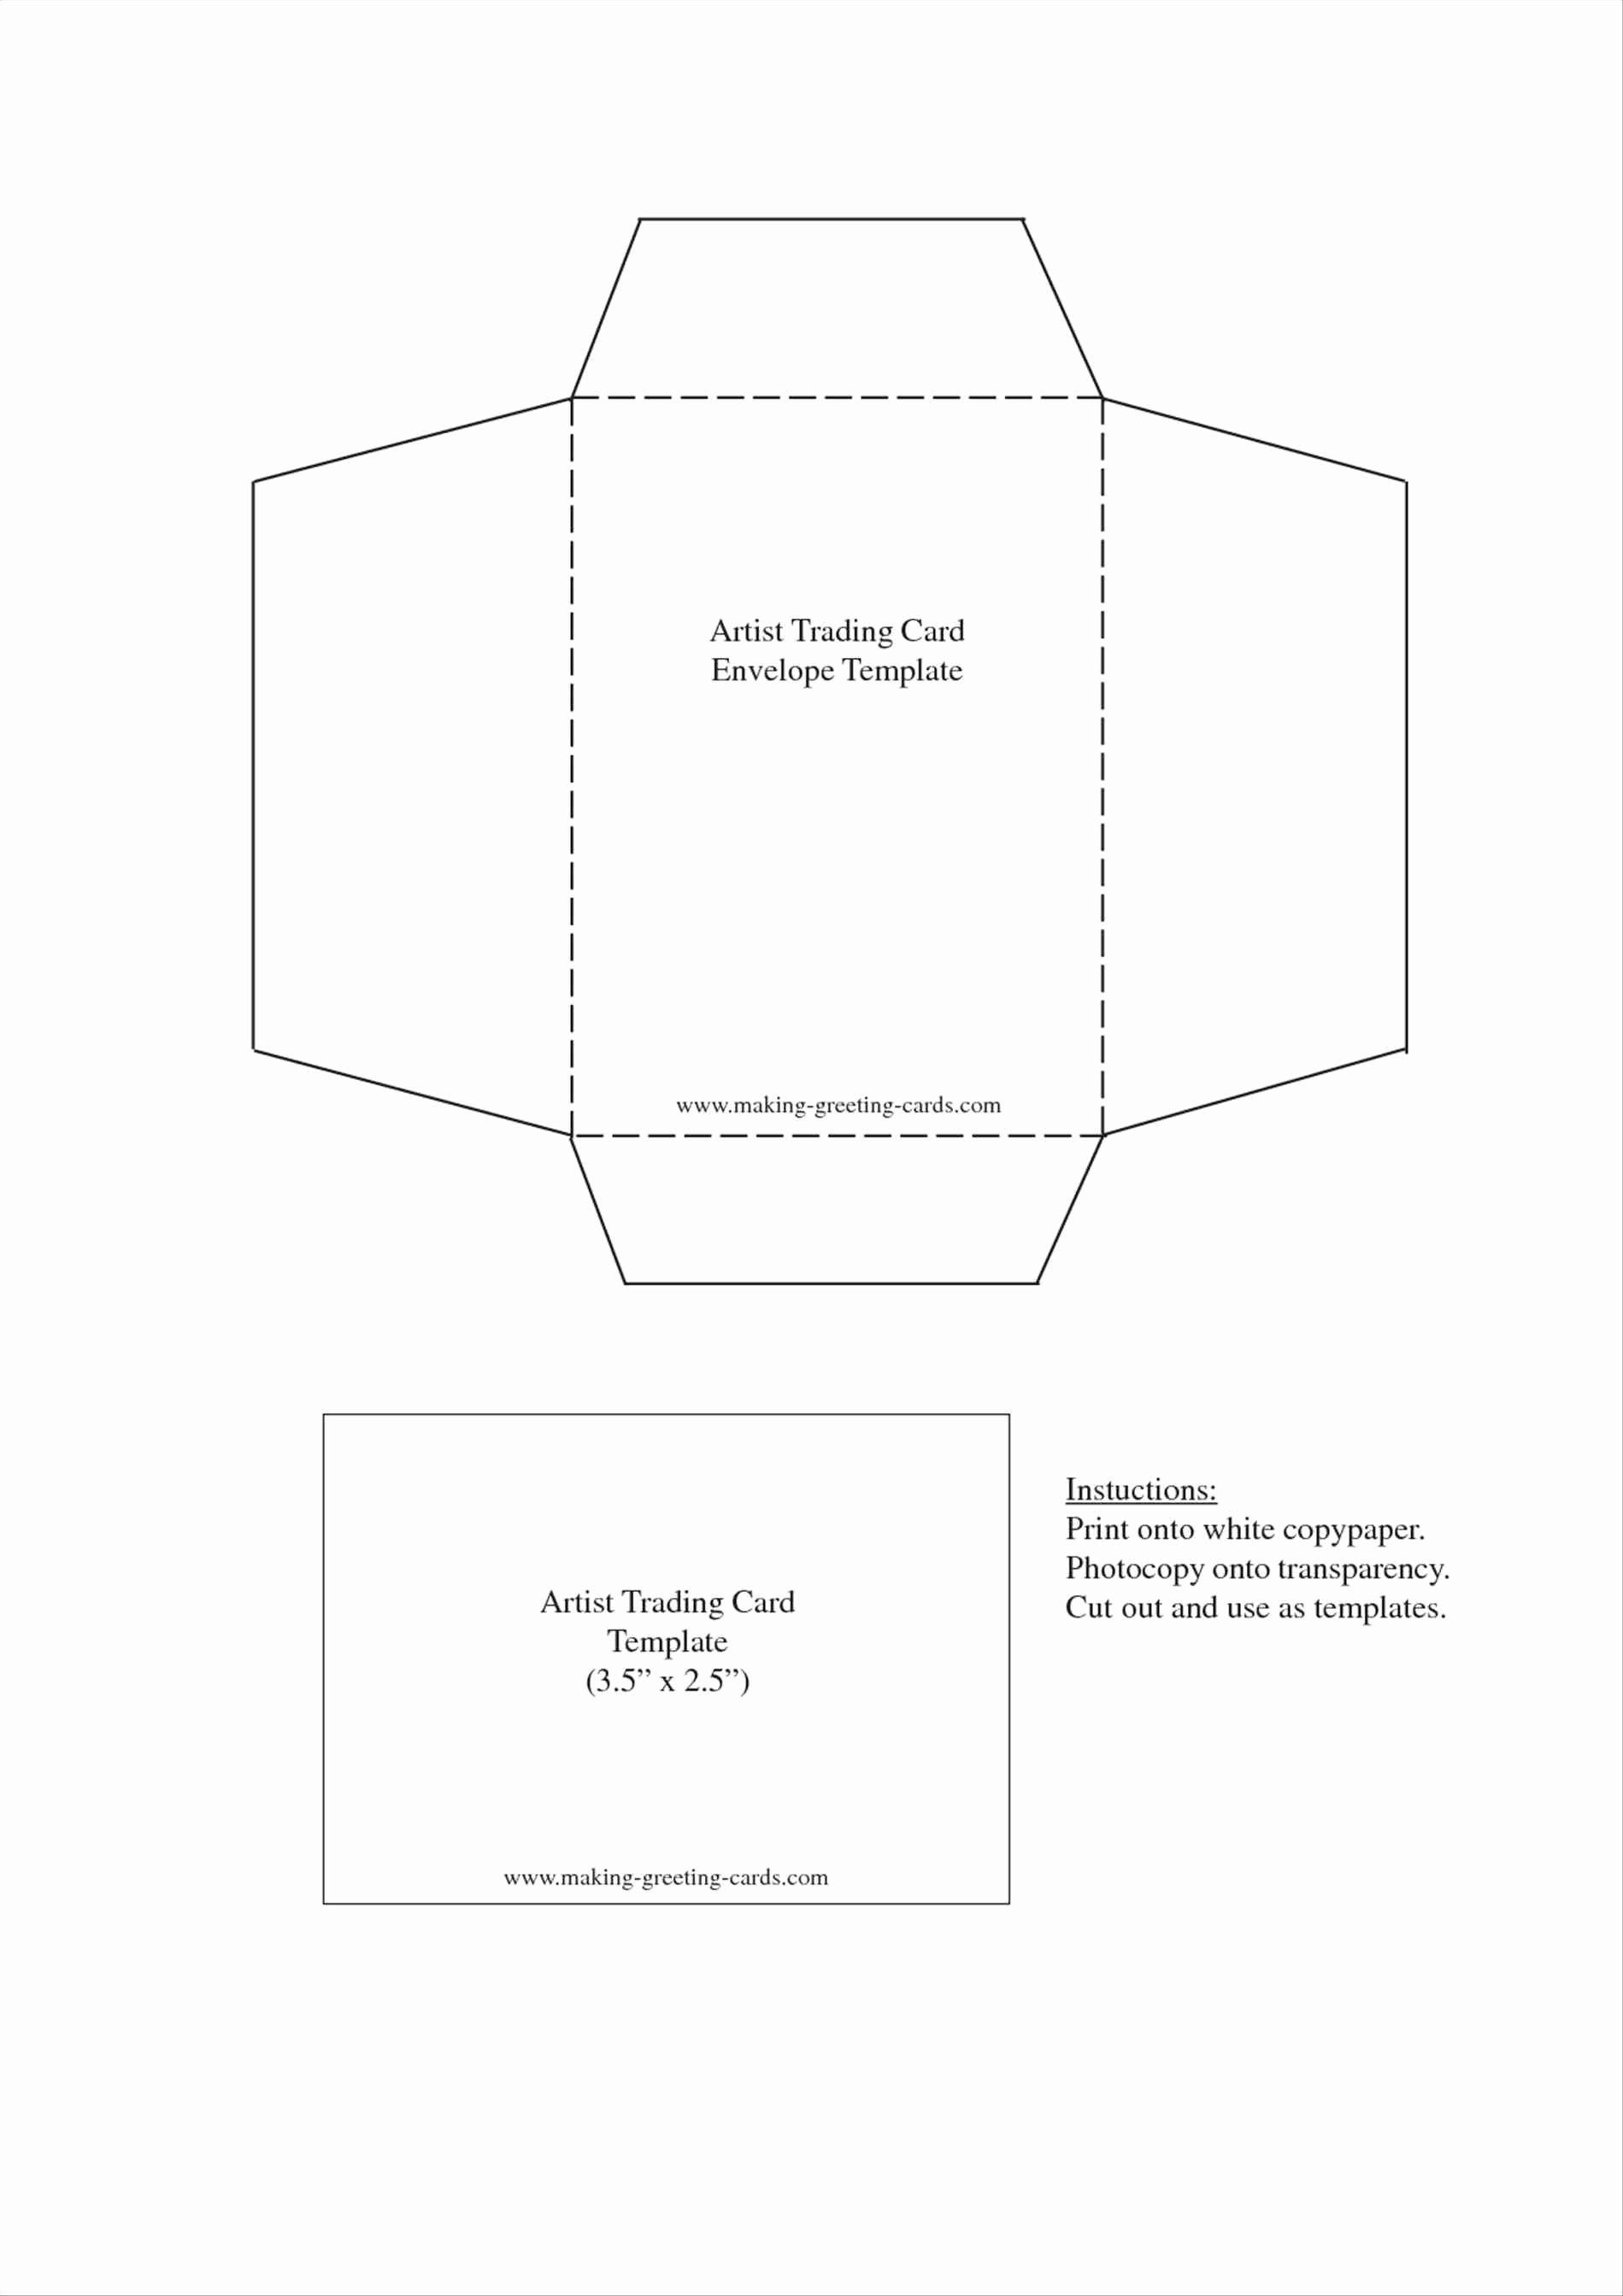 A7 Envelope Template Microsoft Word Unique Envelope Templates Sampletemplatez Sampletemplatez